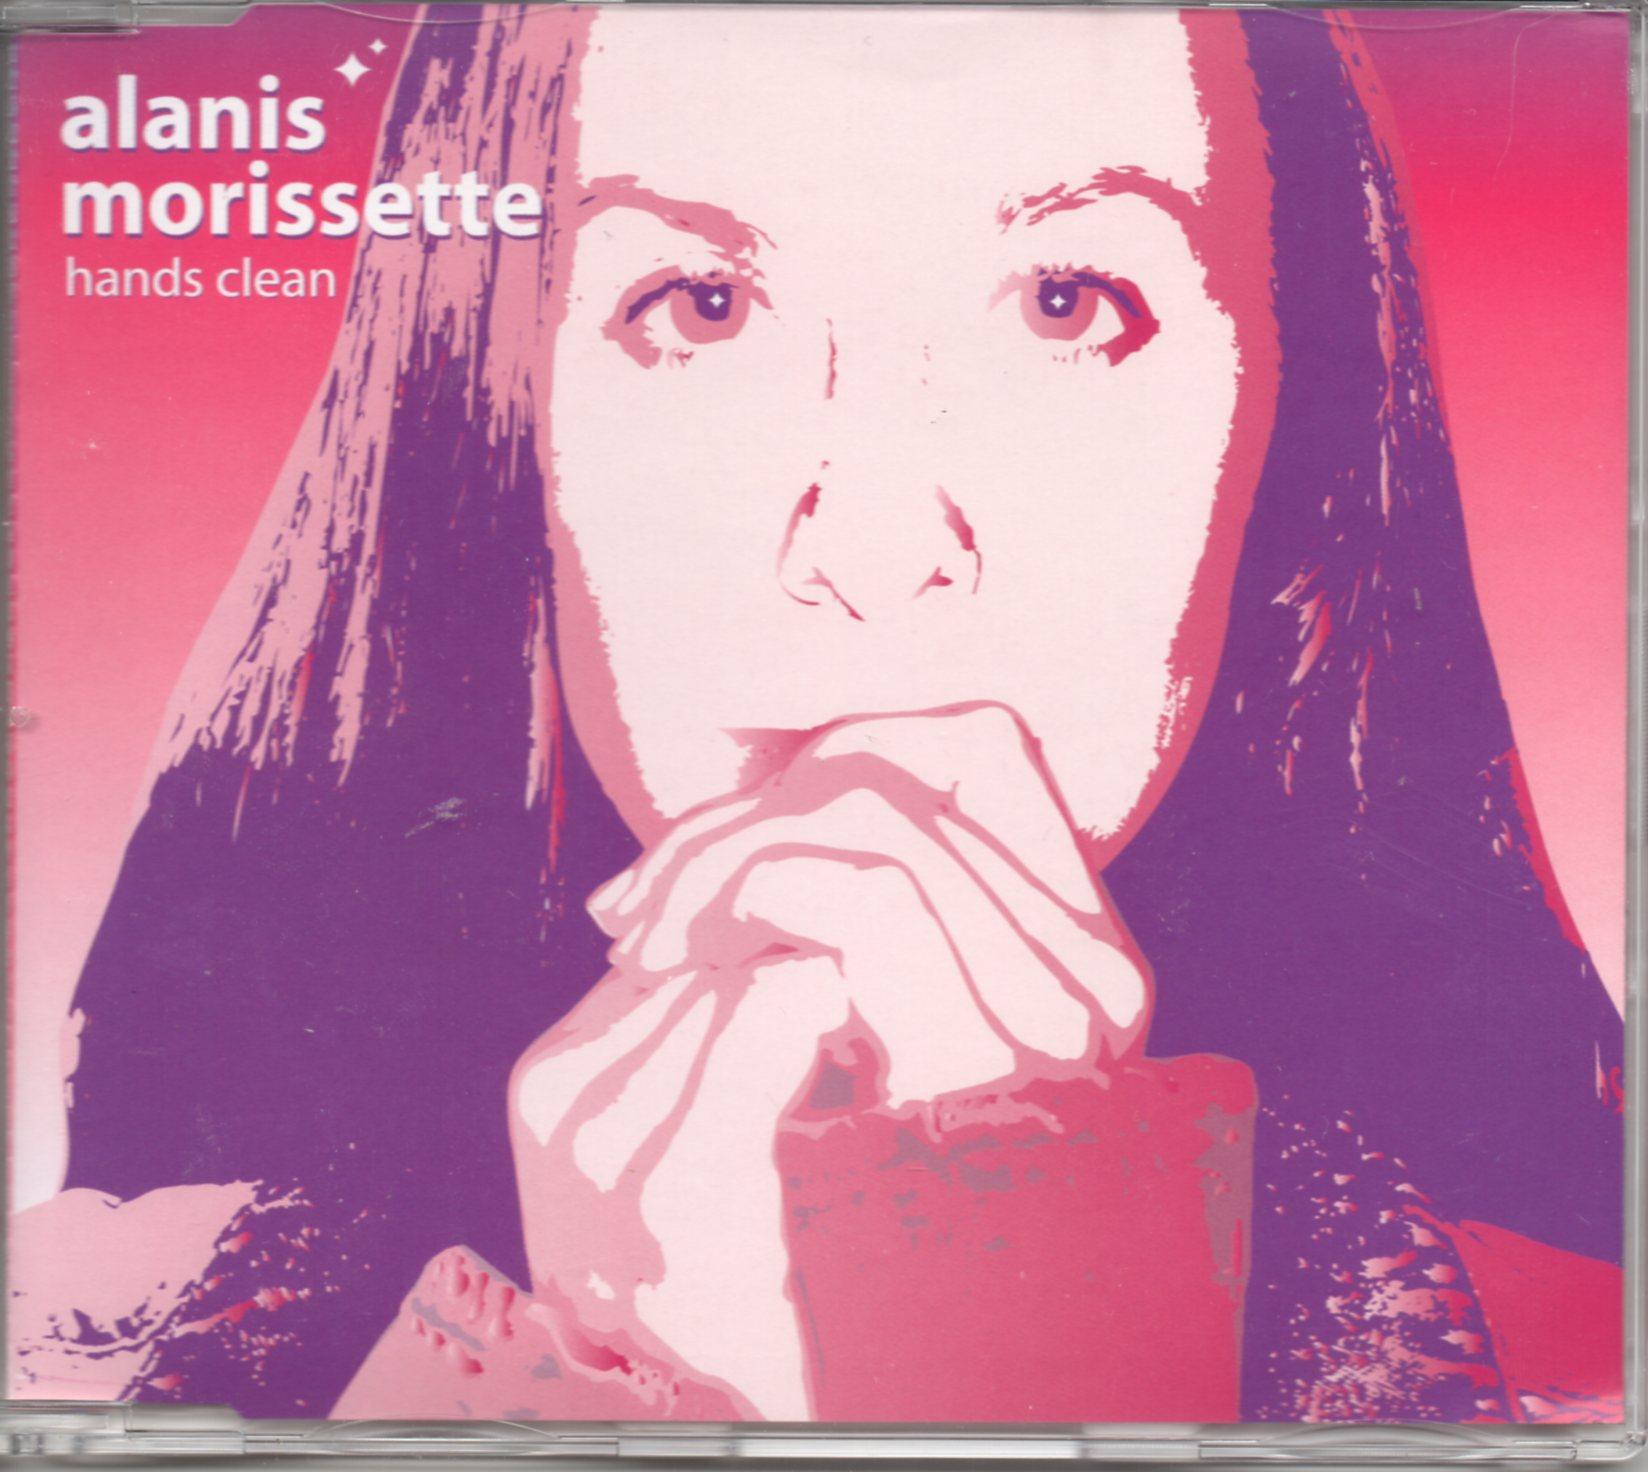 ALANIS MORISSETTE - Hands clean Promo 1-track Jewel Case - CD Maxi